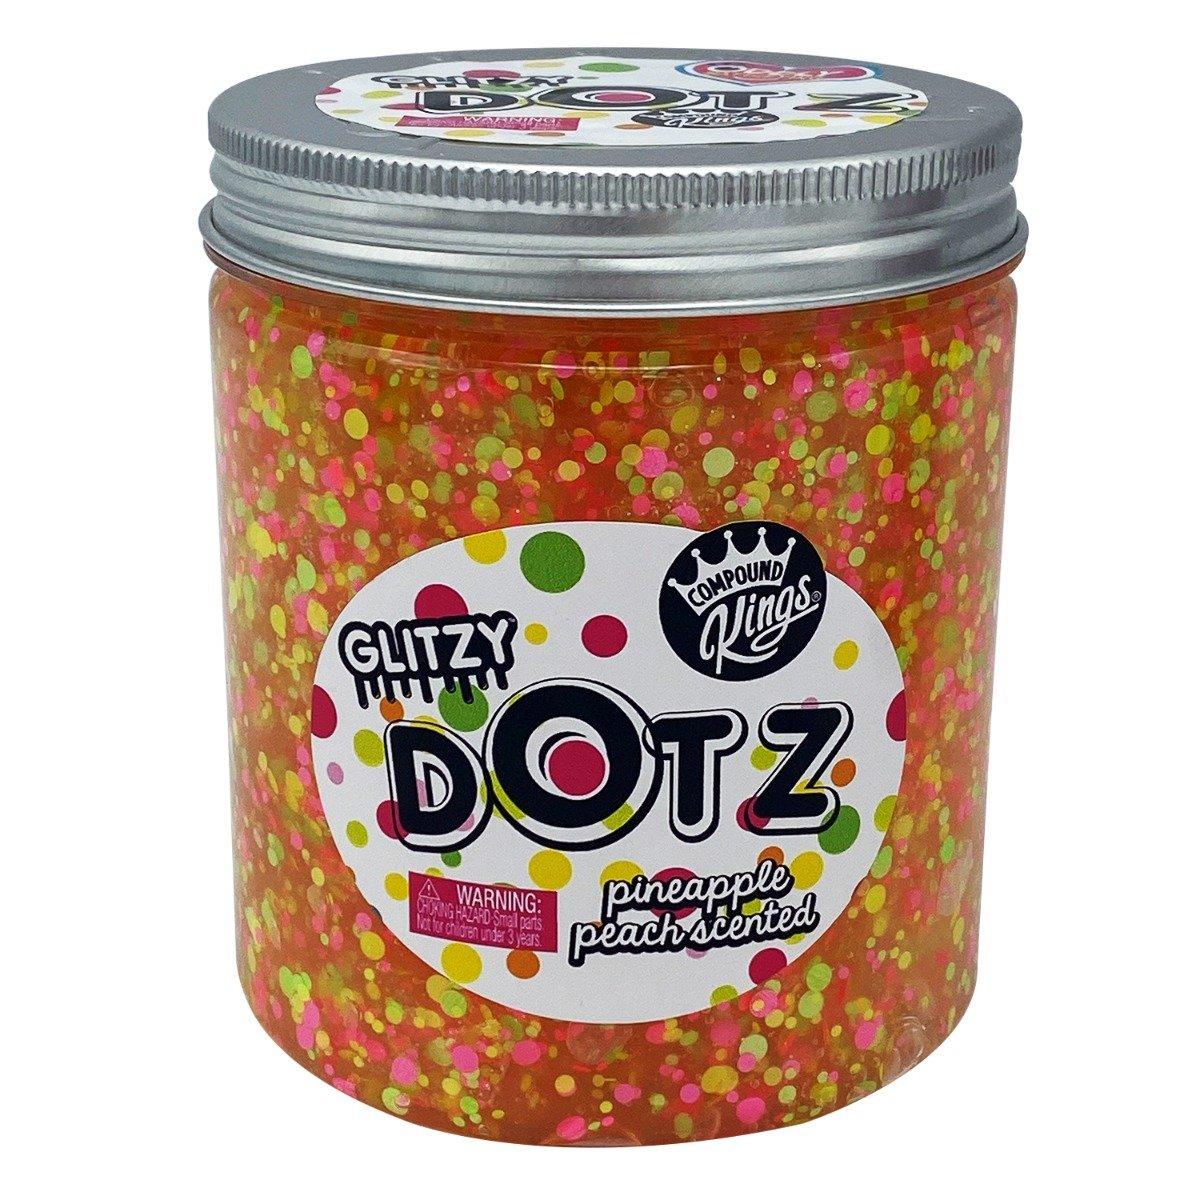 Gelatina Compound Kings - Glitzy Dotz Slime, Pineapple Peach, 425 g imagine